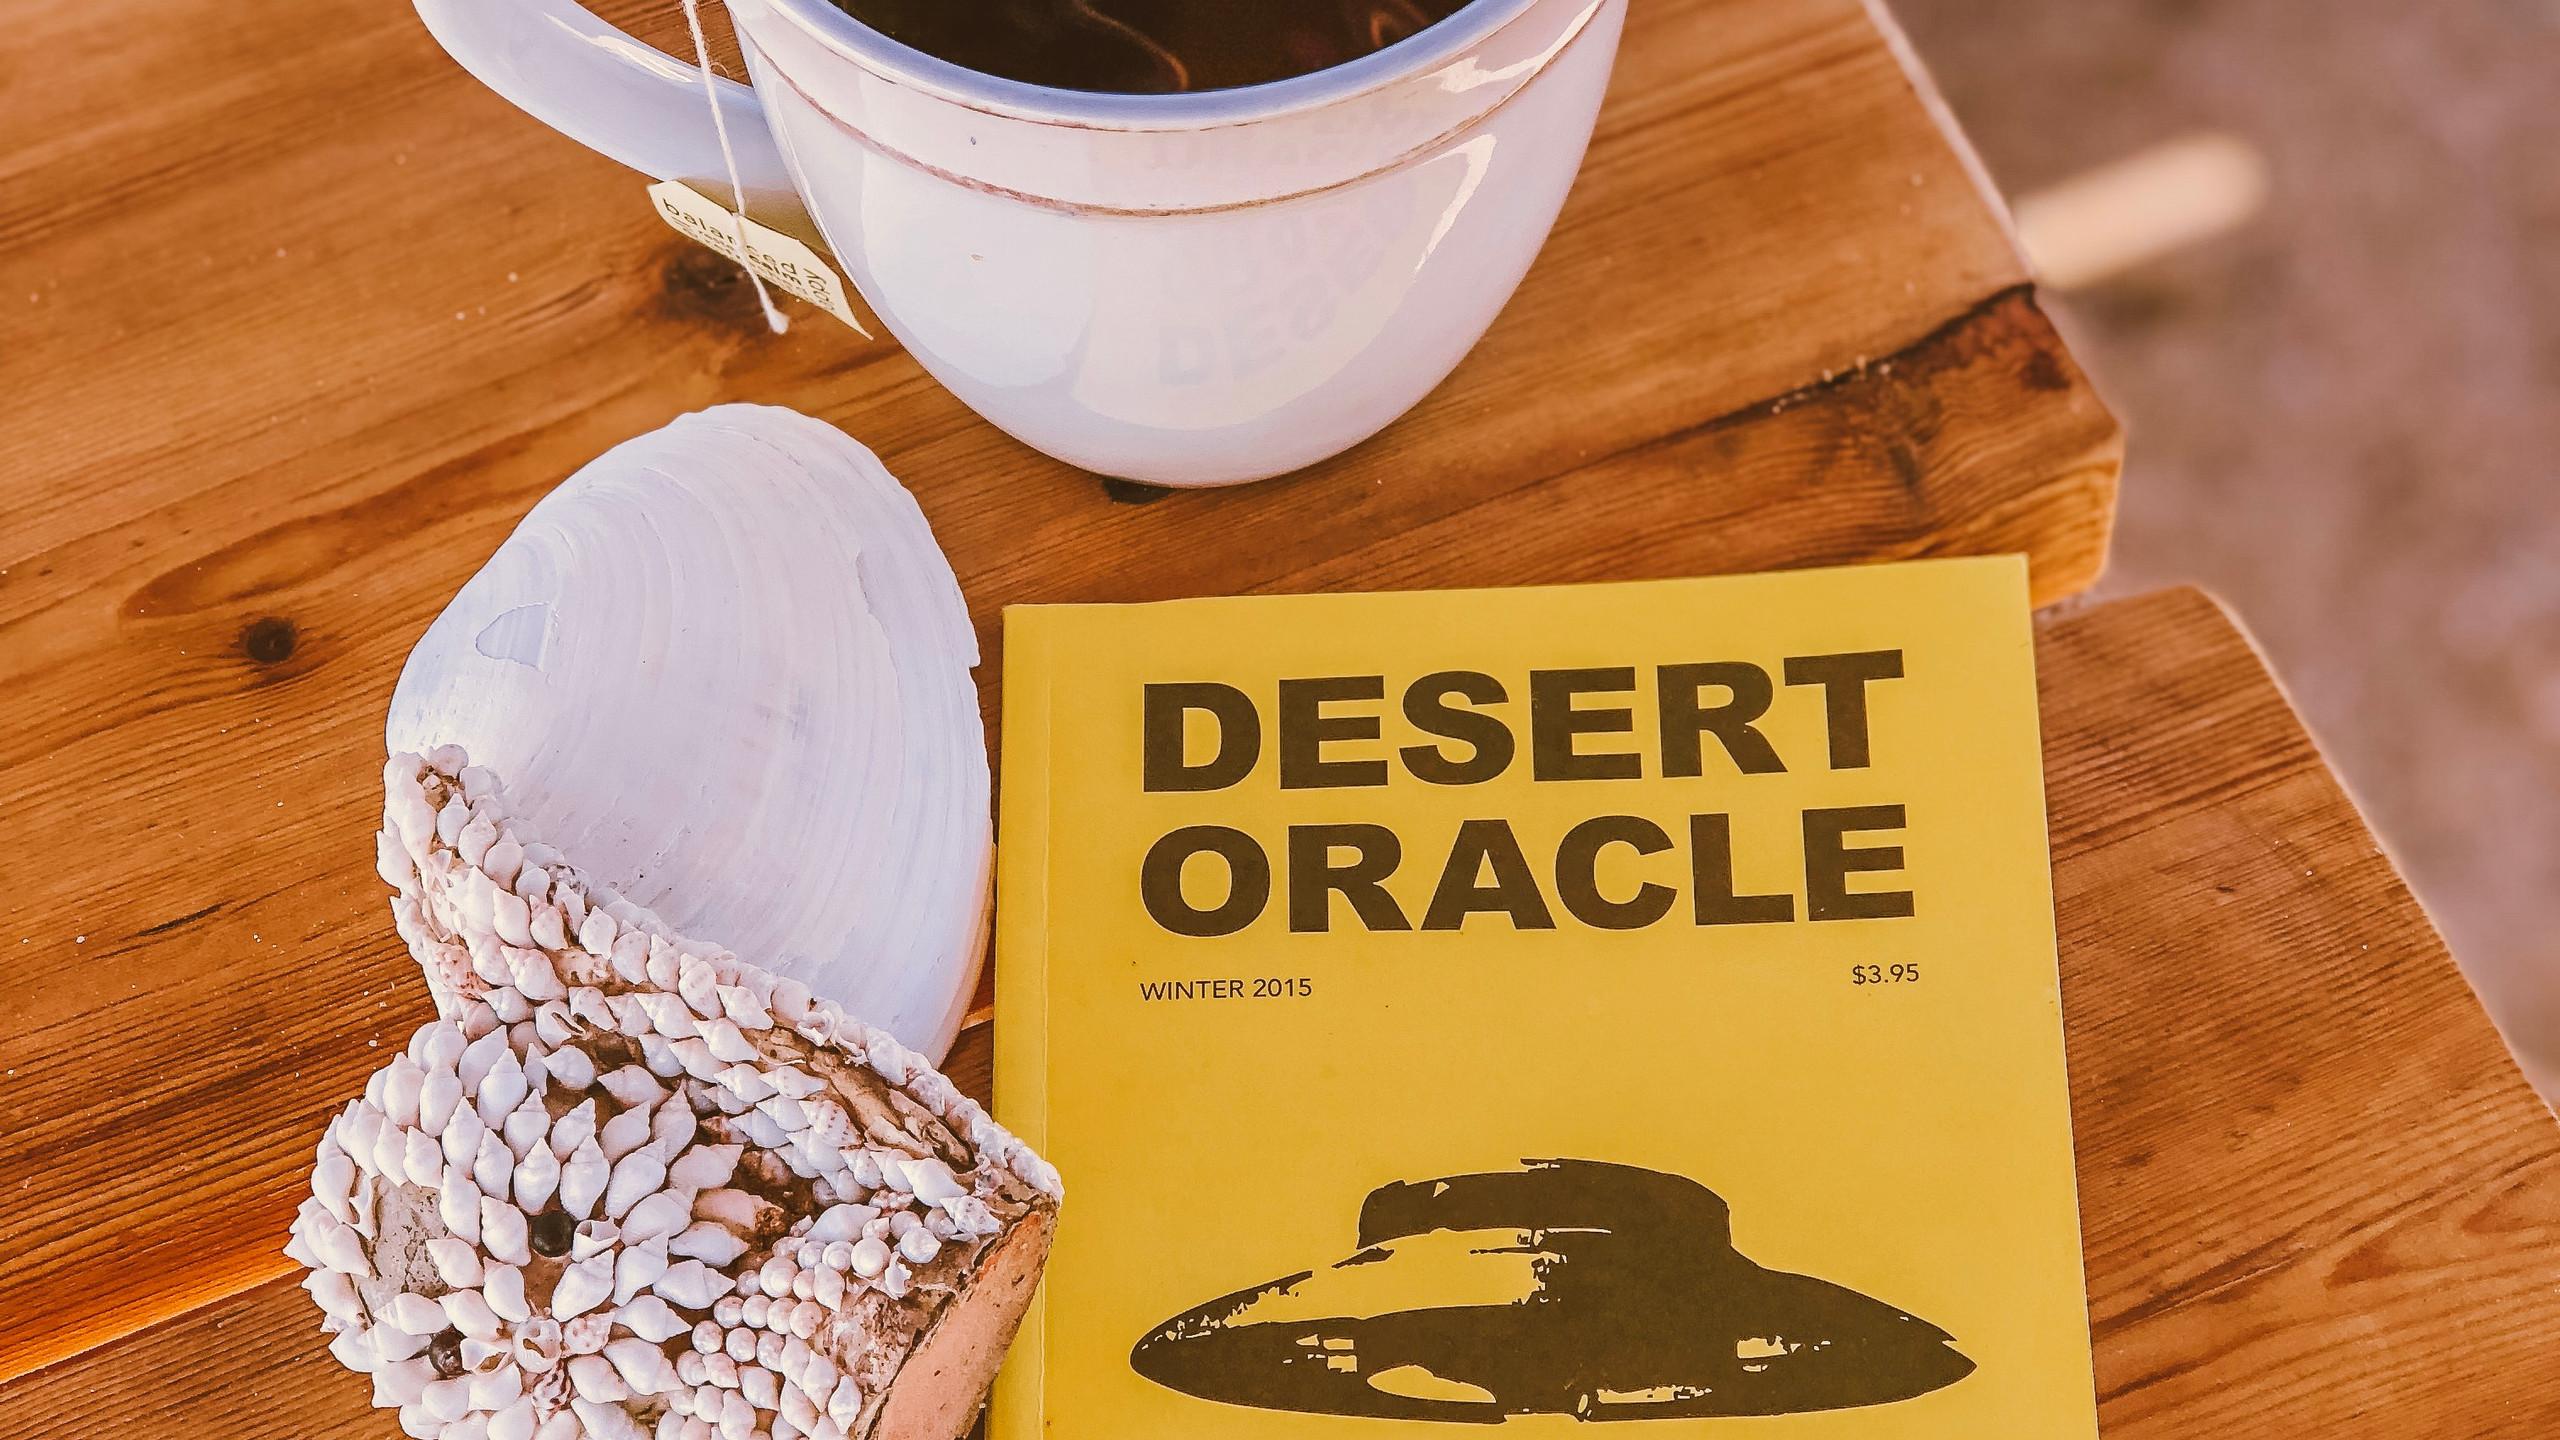 Dessert Reading Material